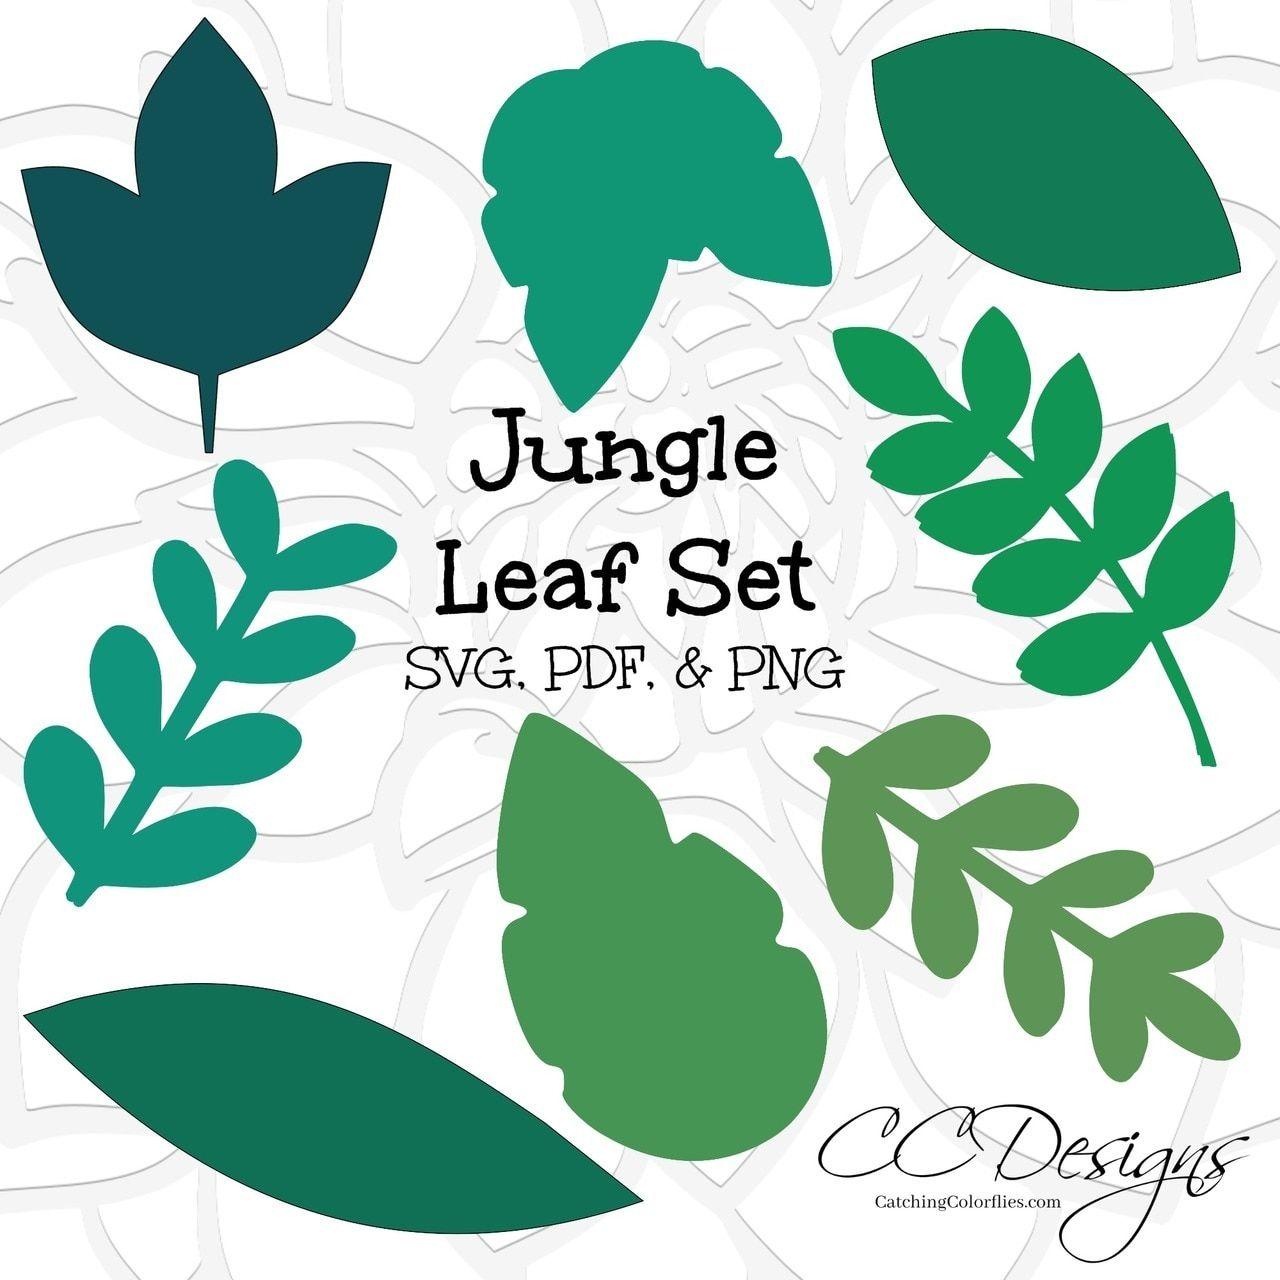 Jungle Safari Leaf Templates- Set of 8 | Crafts and DIY | Pinterest